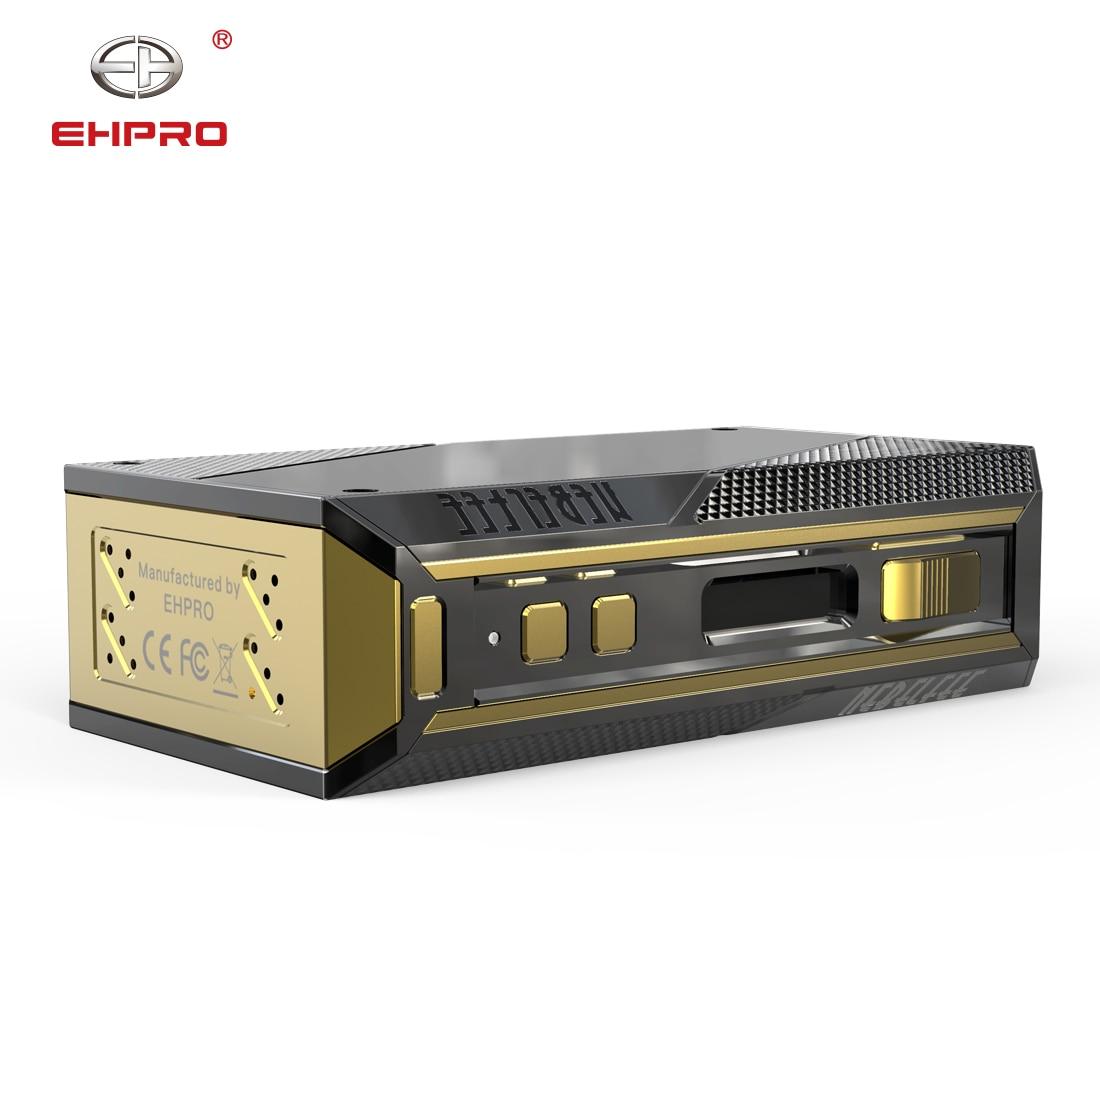 Подарок Vape мод Ehpro холодная сталь 200 TC мод 200 Вт электронная сигарета мод без батареи подходит 510 vape Танк vs dovpo topside/drag mini - 6